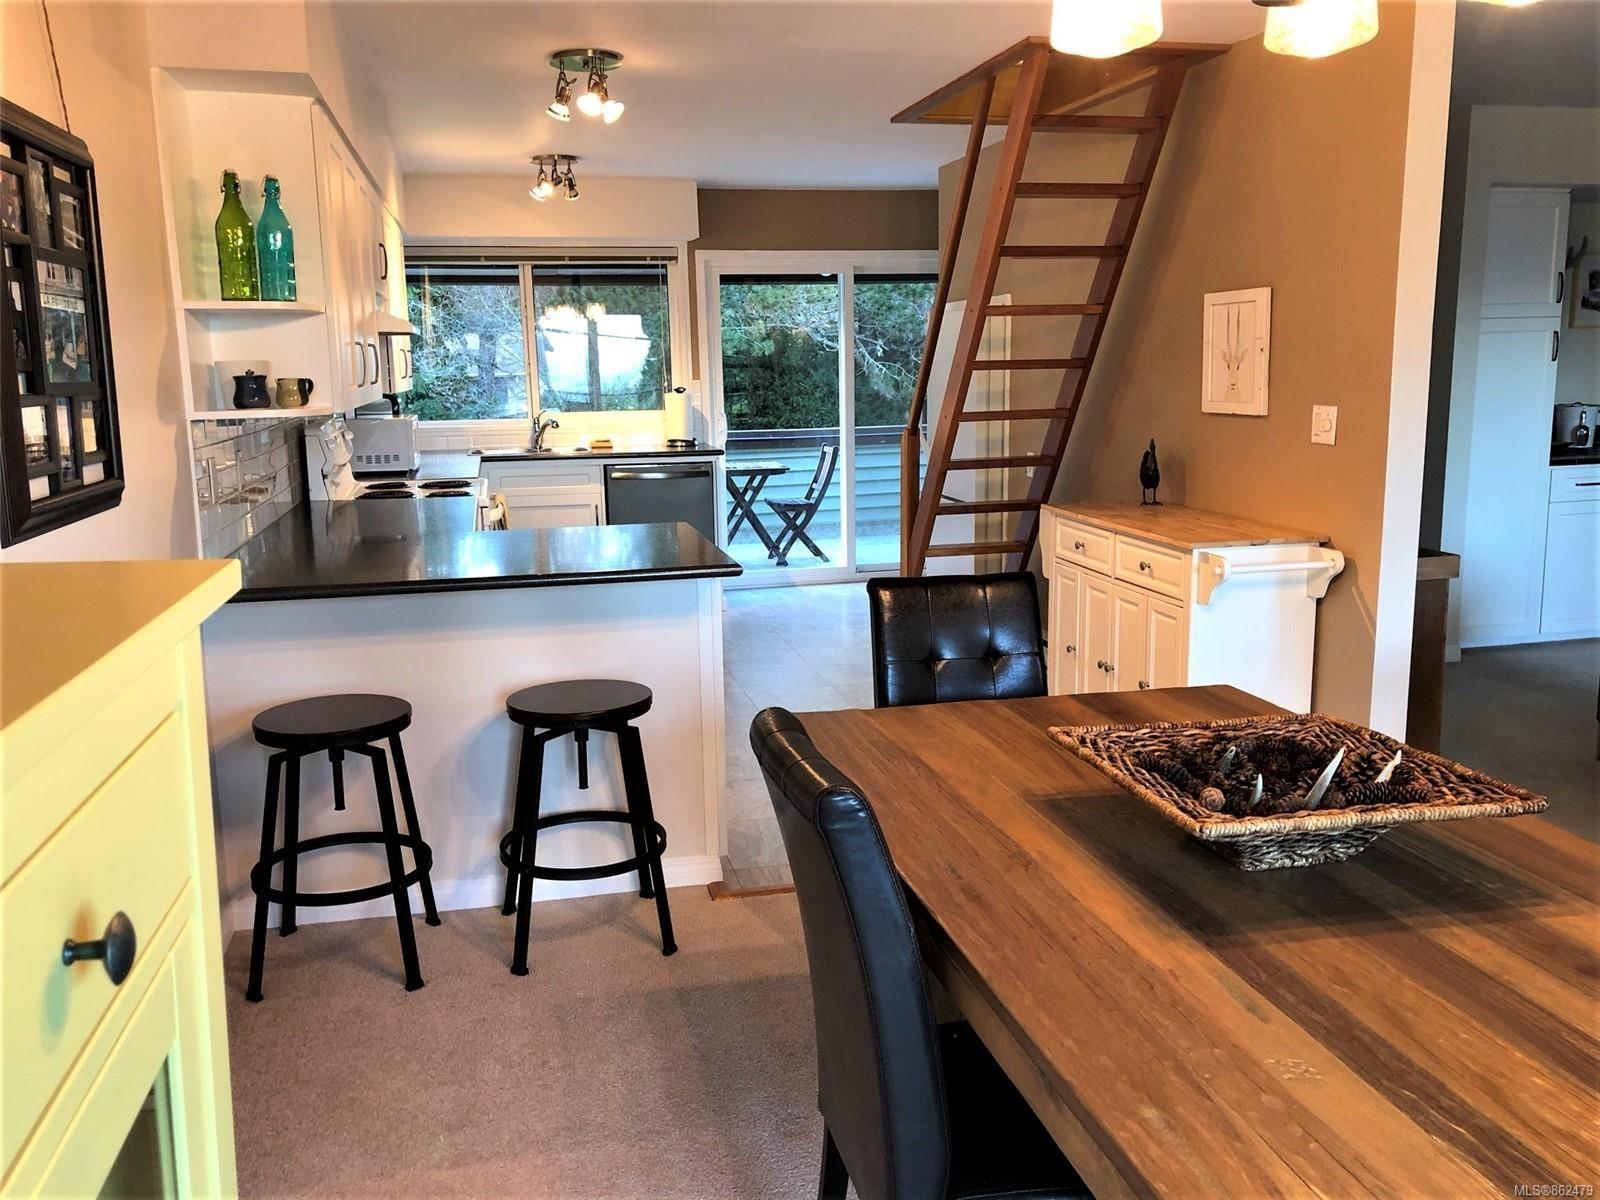 Photo 19: Photos: 6 570 W CRESCENT Rd in : PQ Qualicum Beach Row/Townhouse for sale (Parksville/Qualicum)  : MLS®# 862479